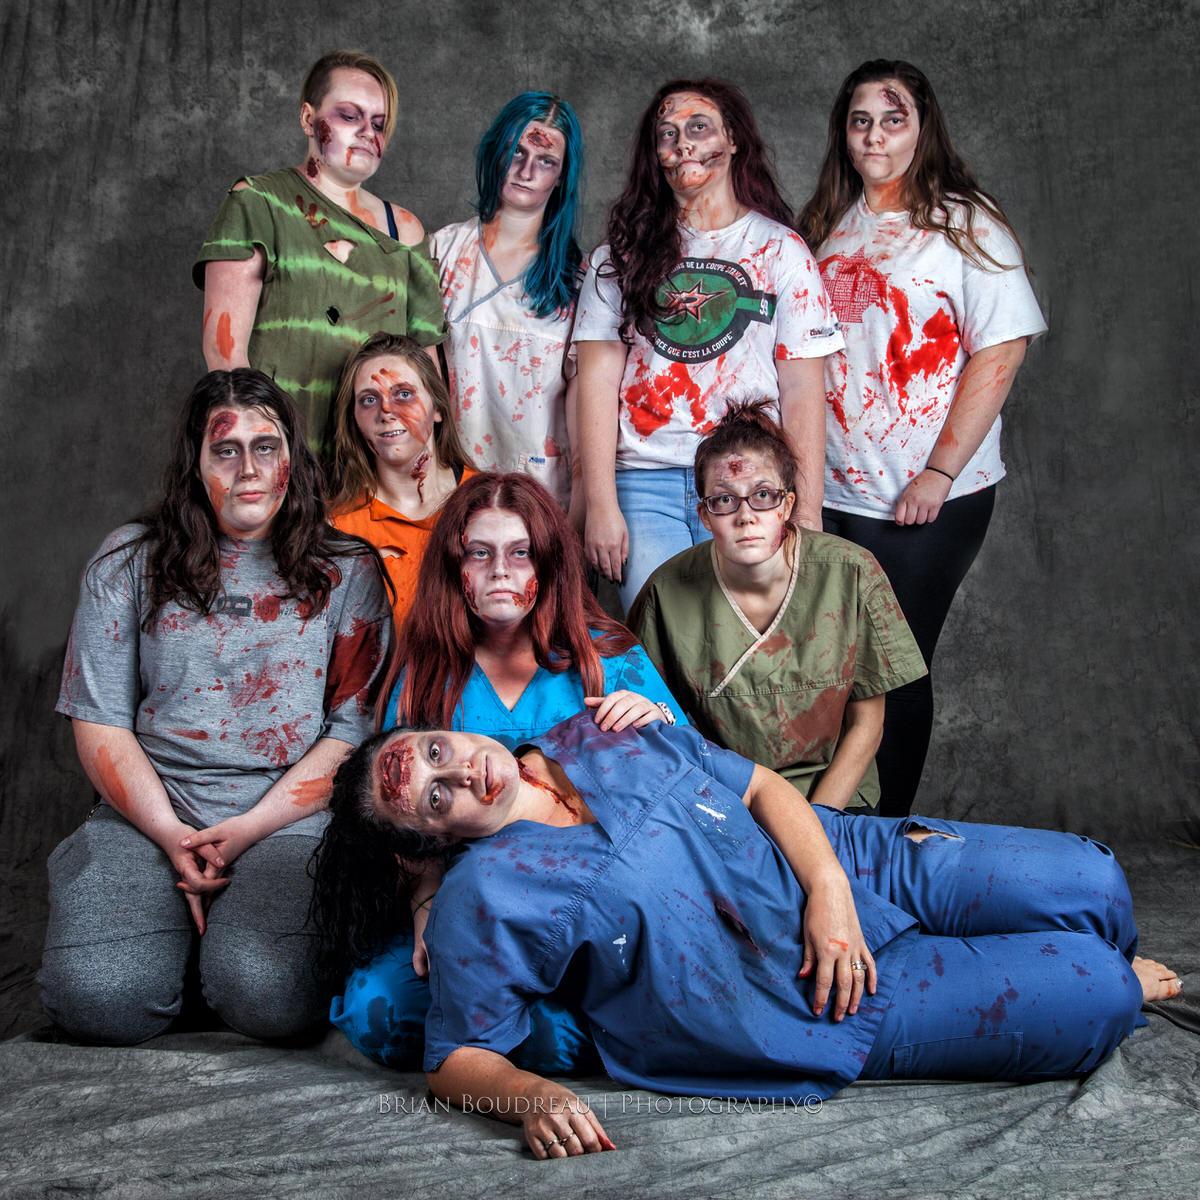 nbpc-zombie-horror-img_5437-edit-copy